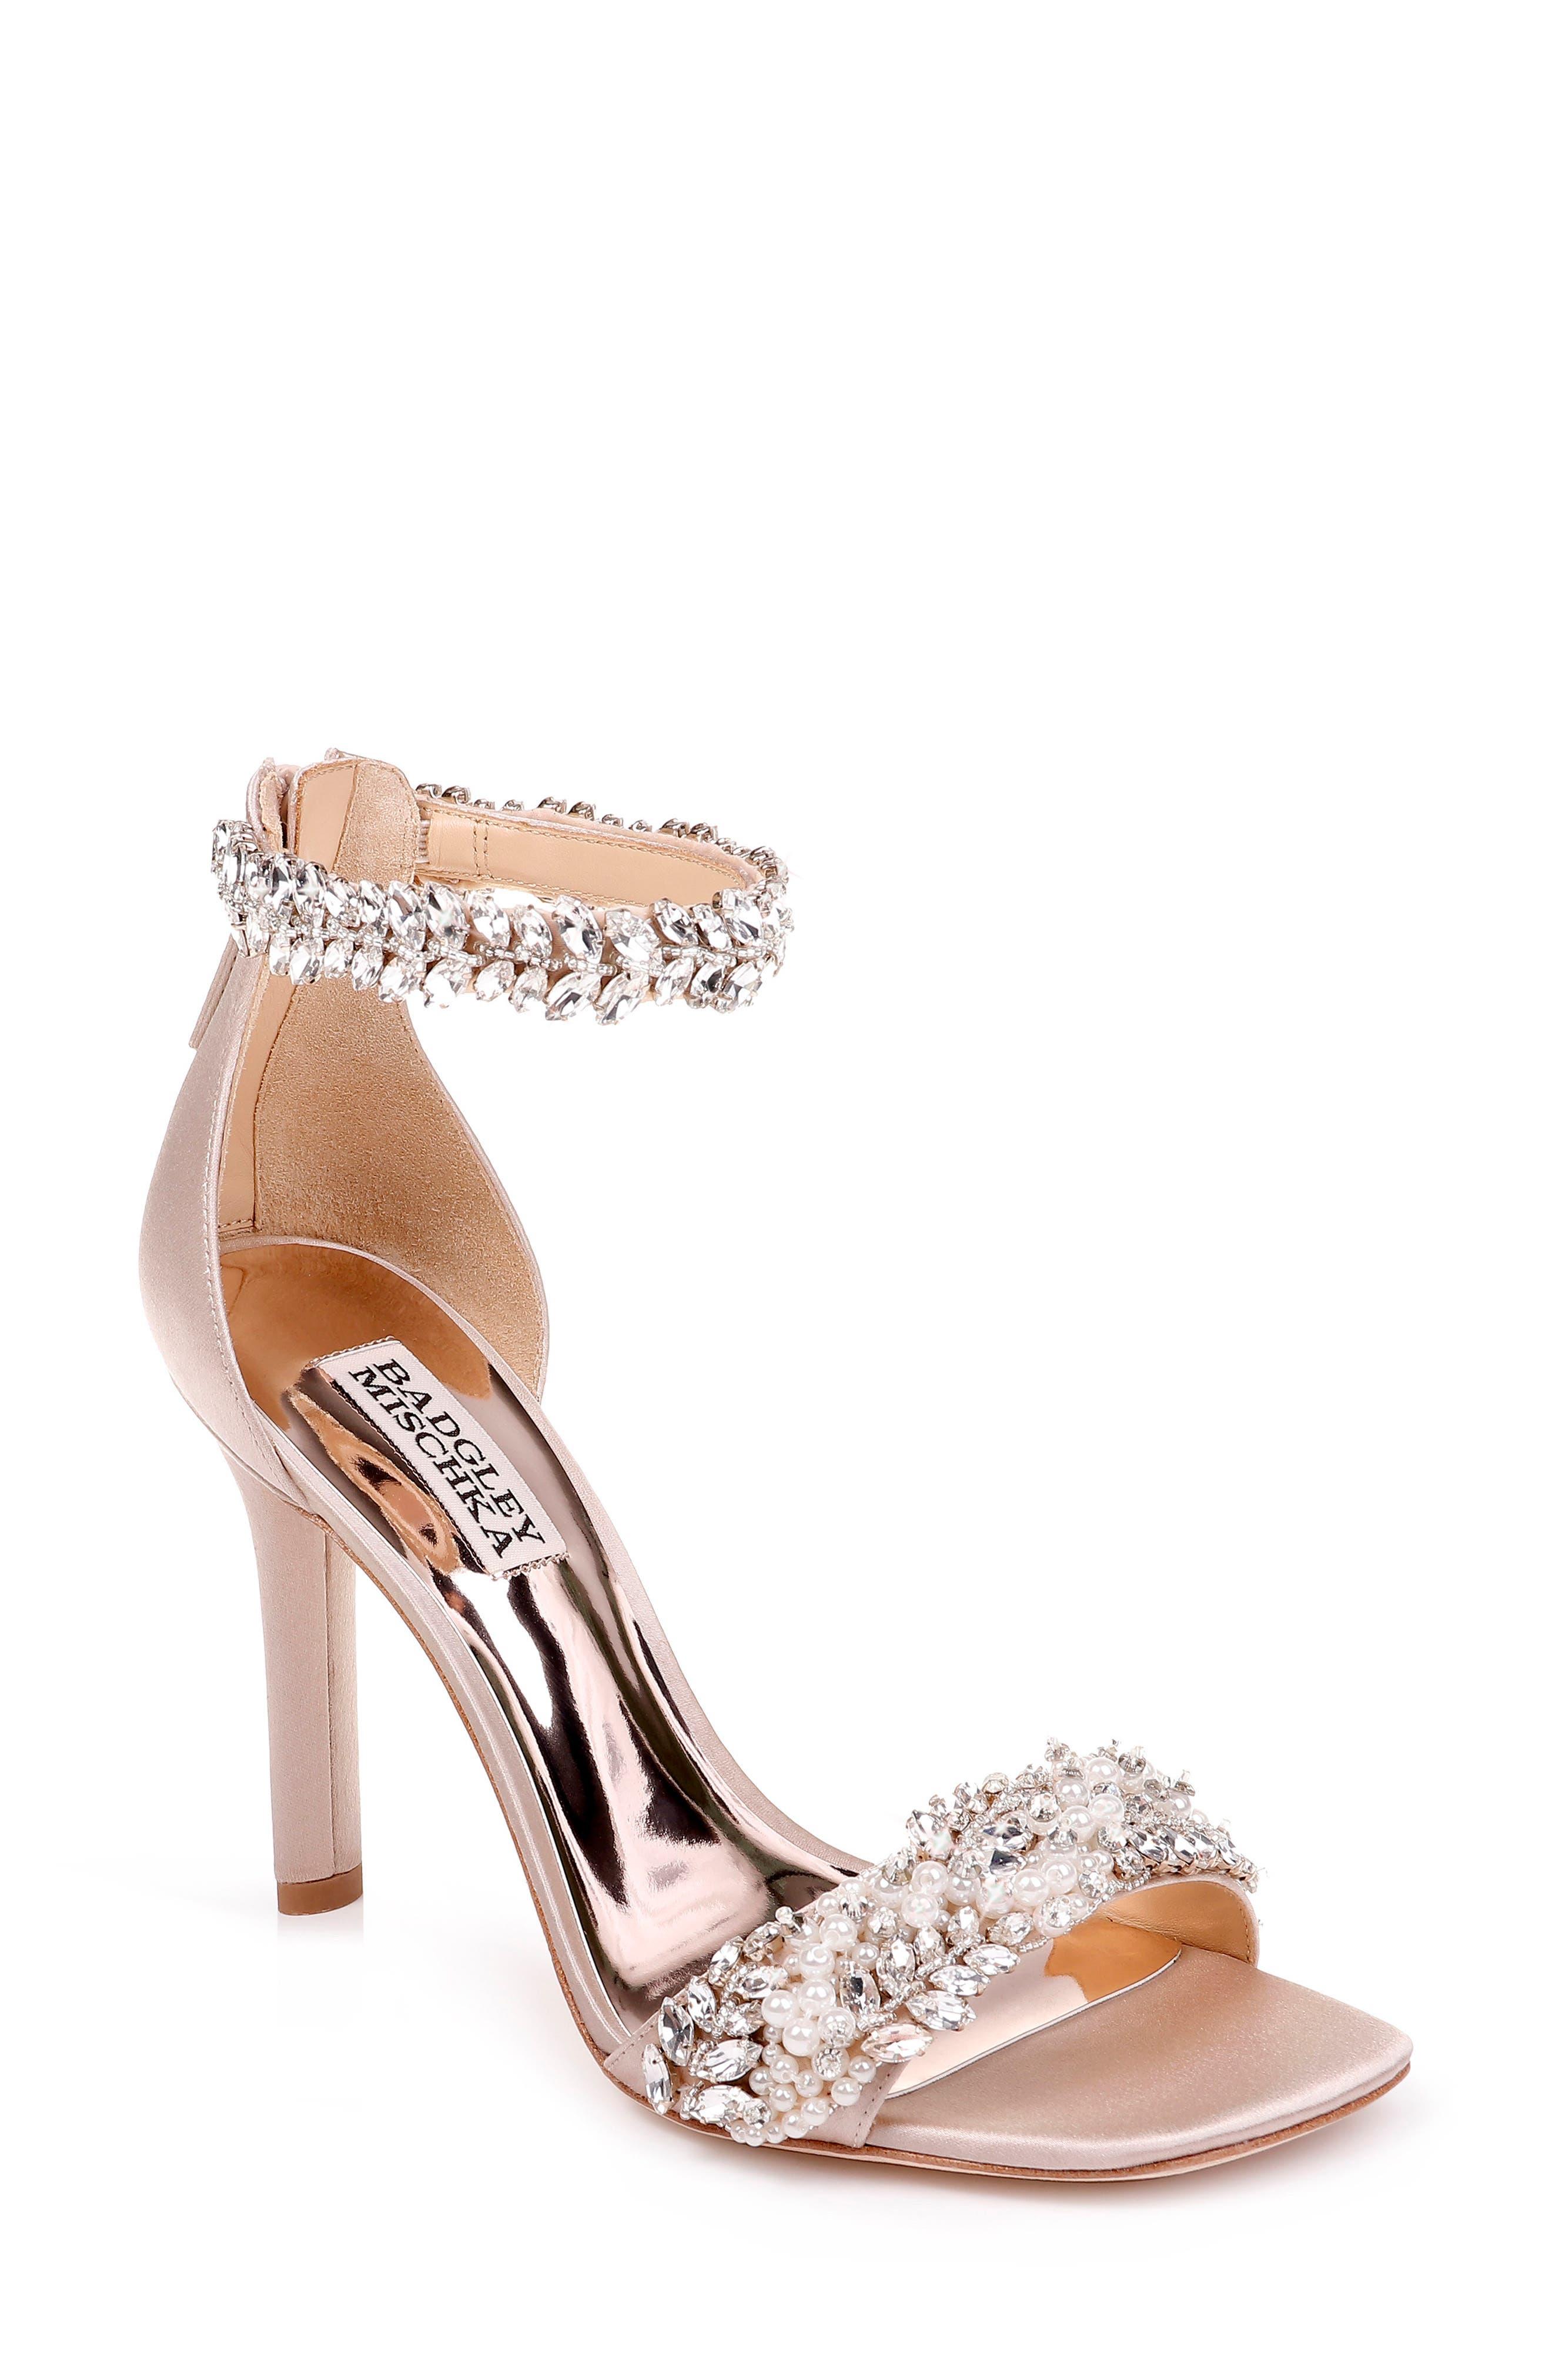 BADGLEY MISCHKA COLLECTION Badgley Mischka Fiorenza Crystal & Imitation Pearl Embellished Sandal, Main, color, BEIGE SATIN